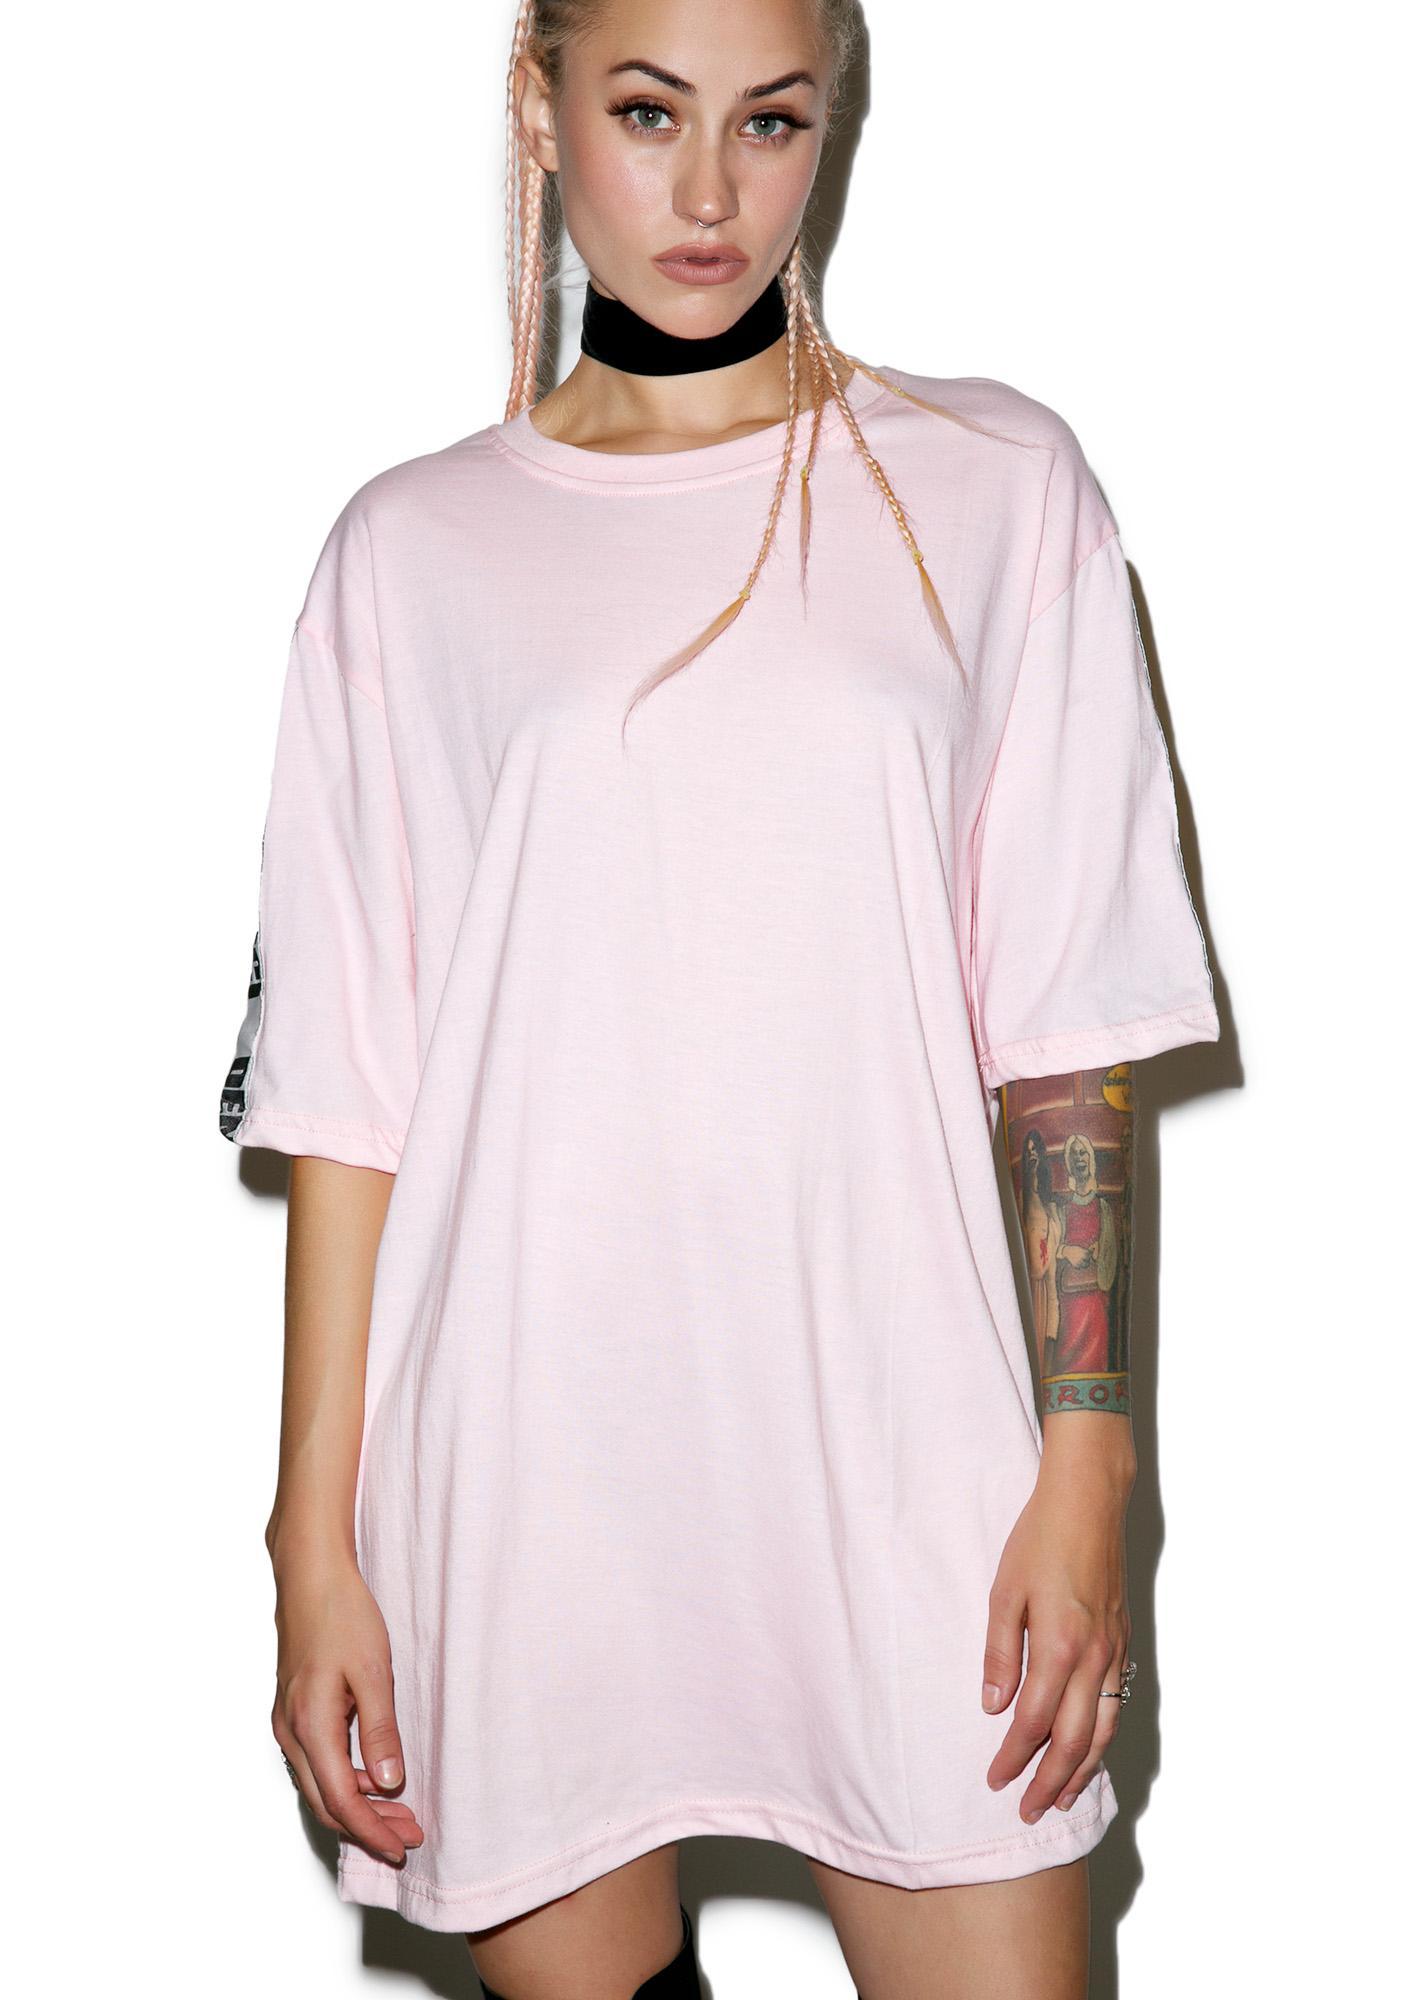 Demian Renucci Flushed DR Oversize T-Shirt